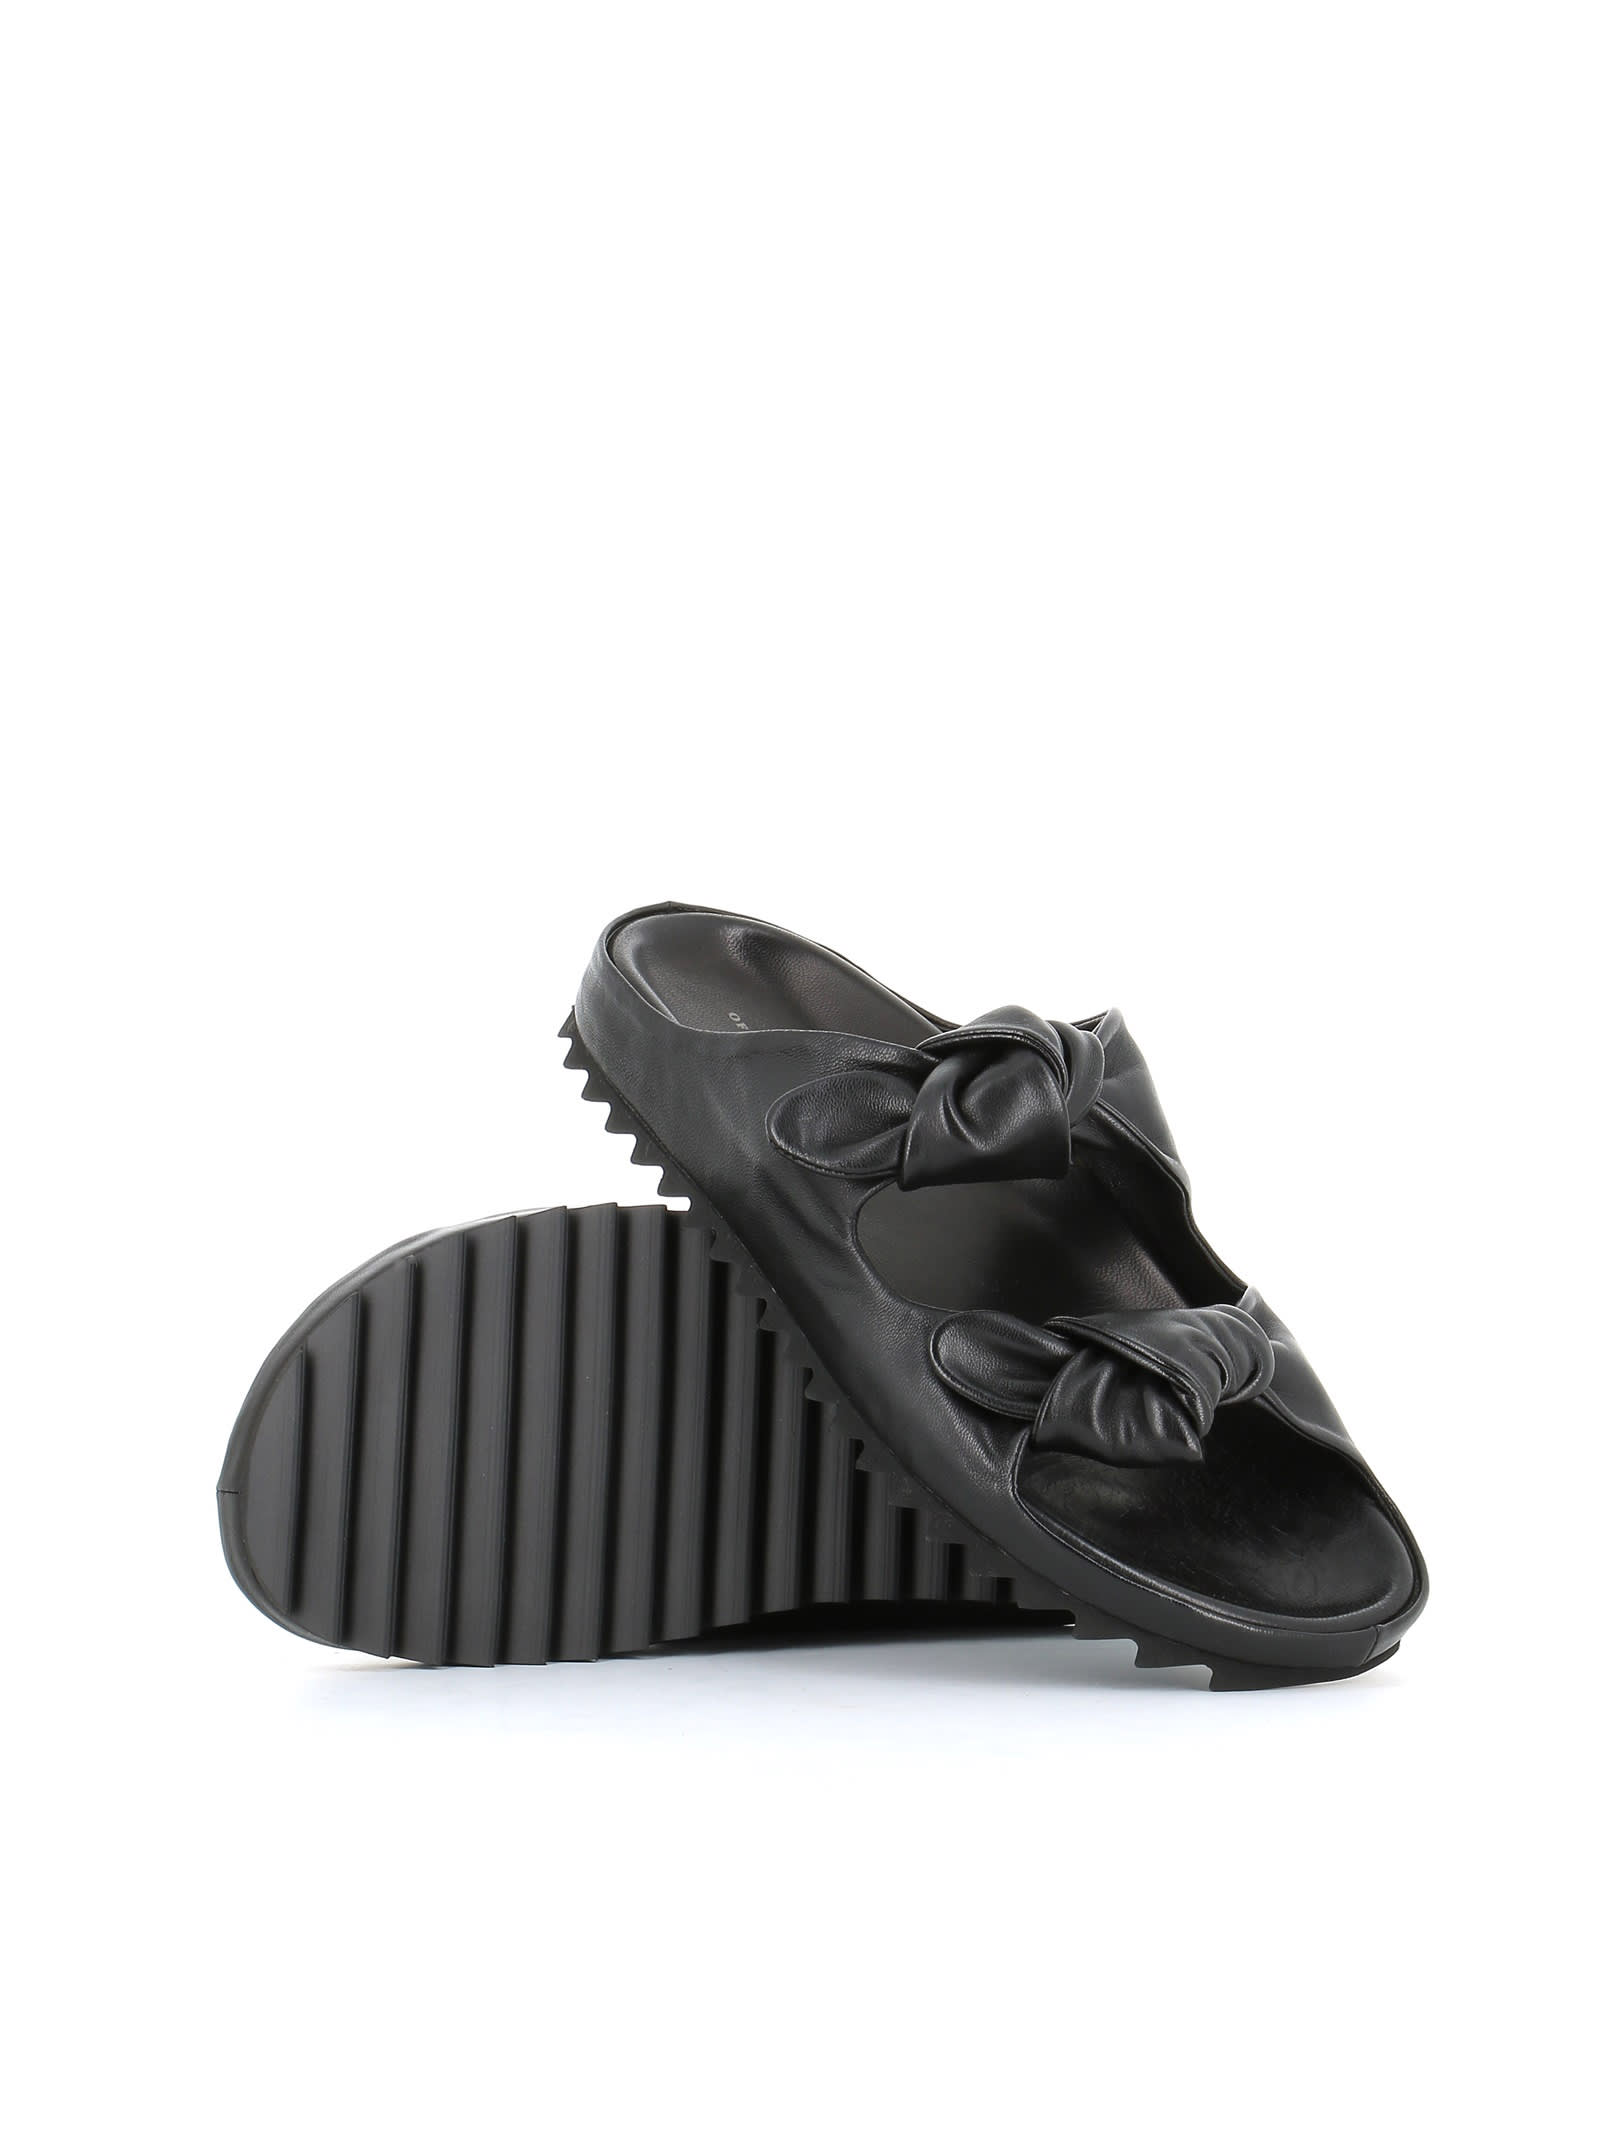 Officine Creative Shoes CIABATTA PELAGIE/010